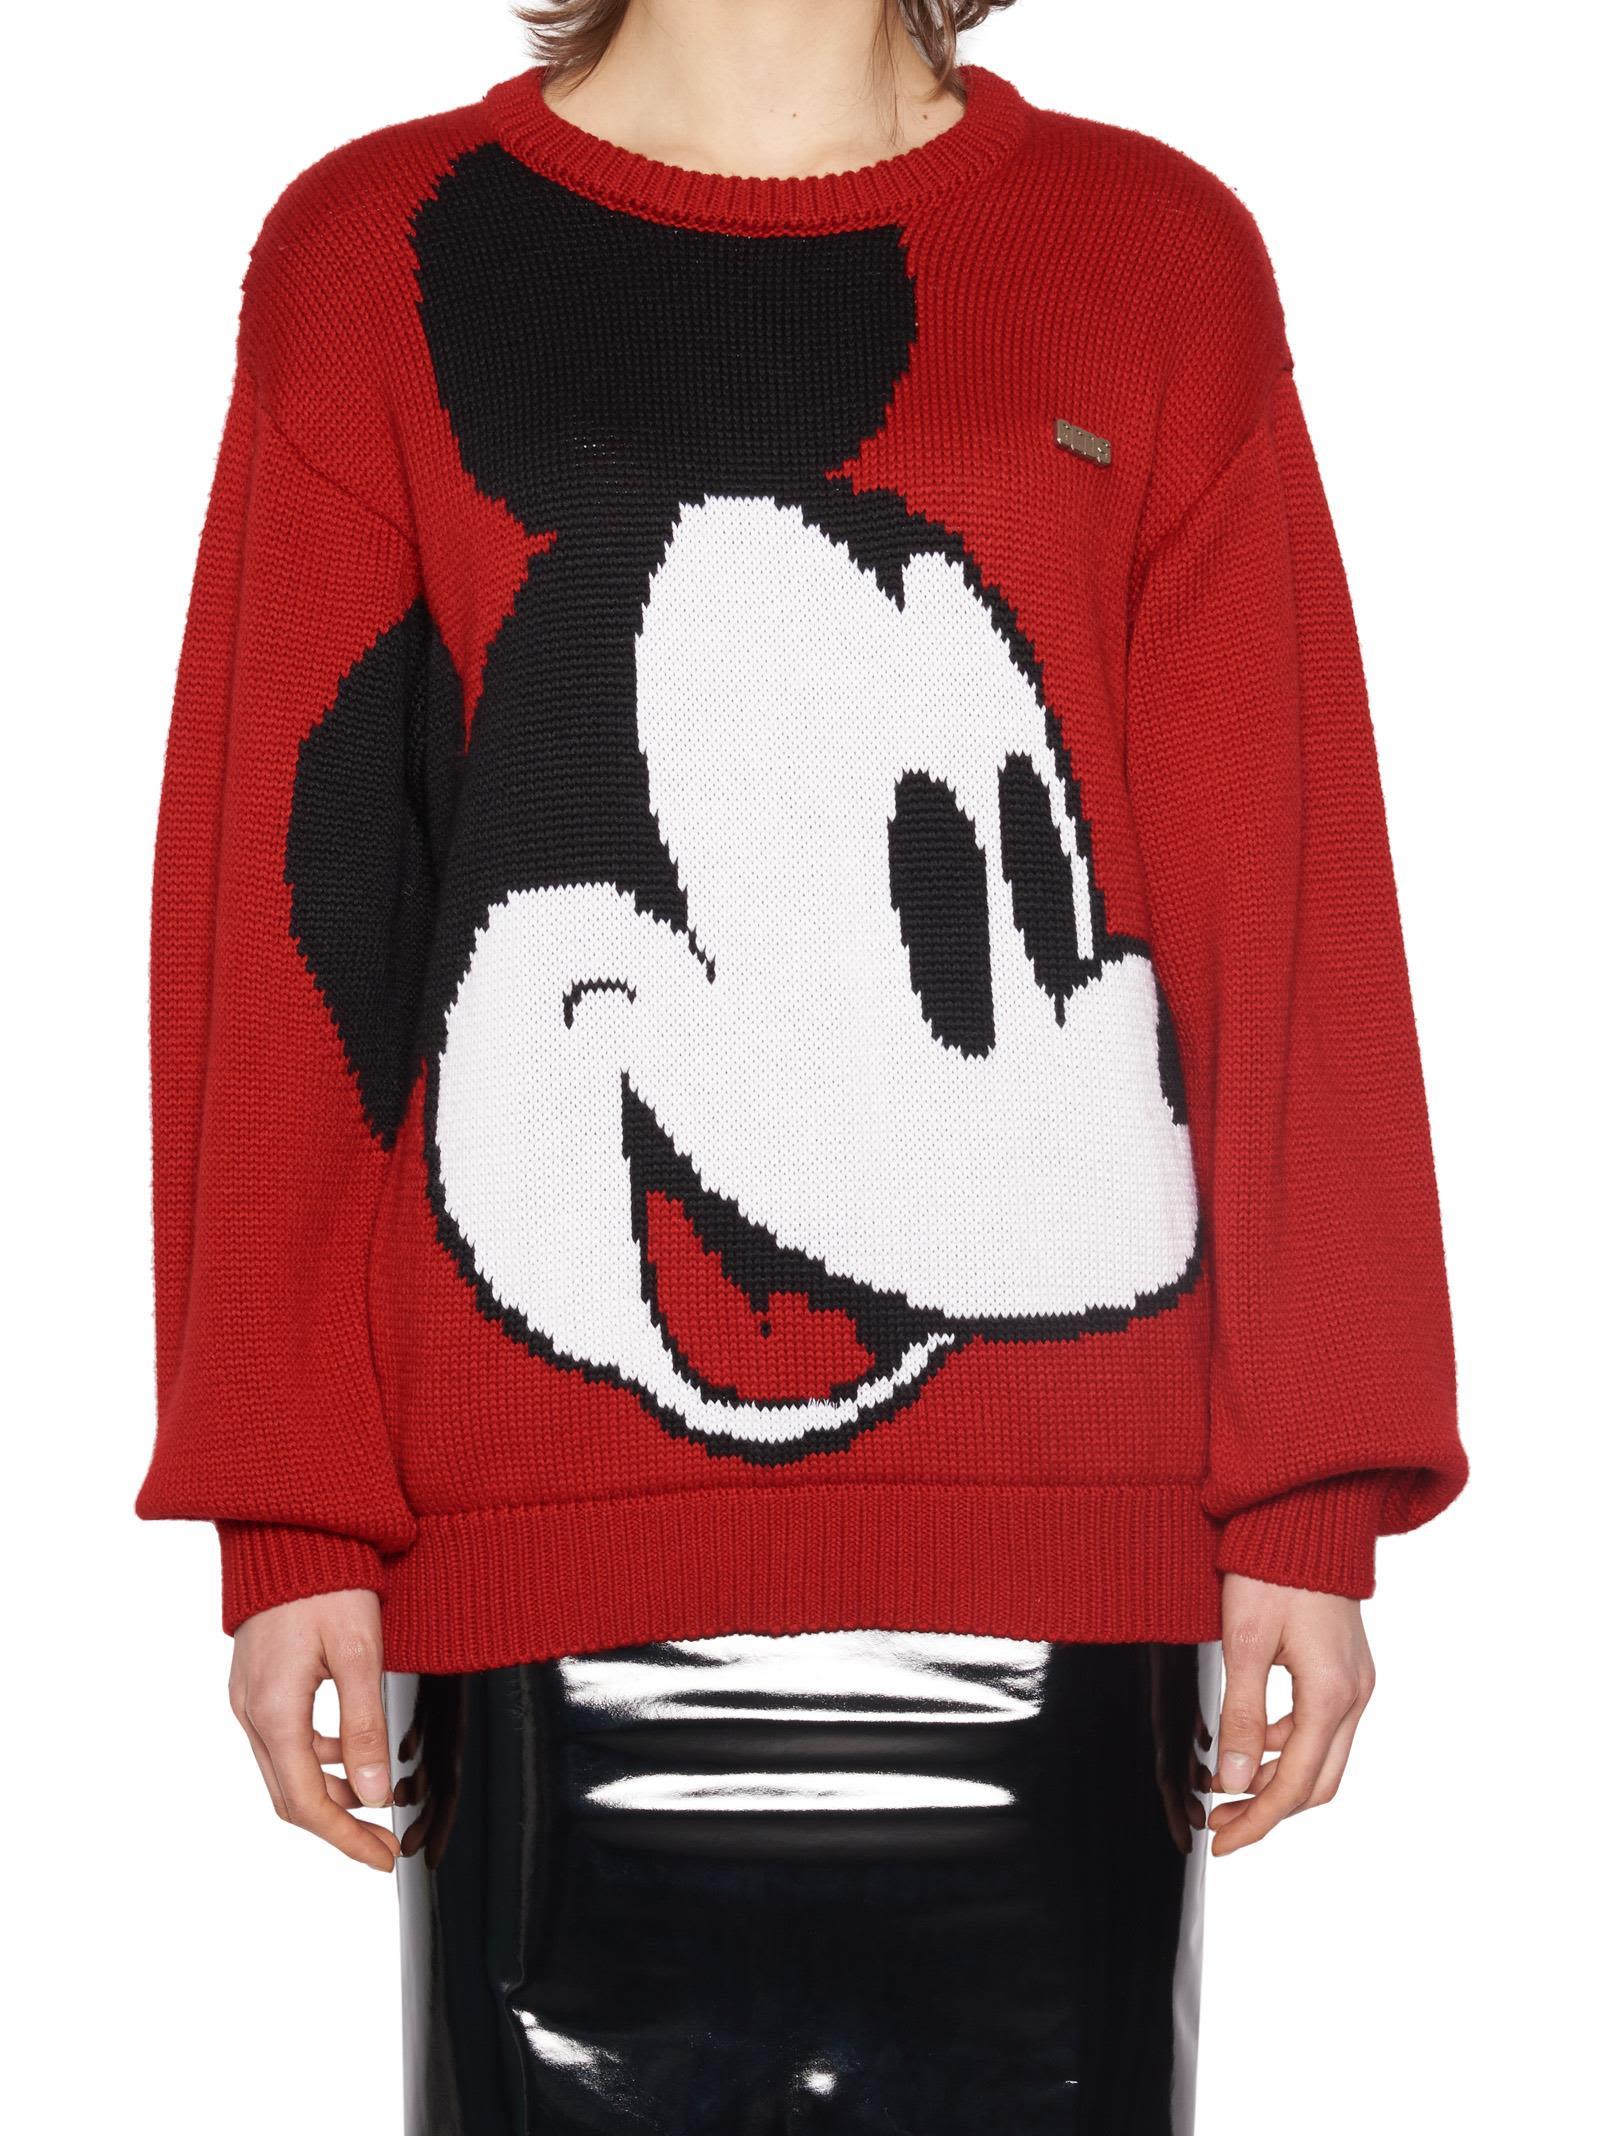 Gcds Gcds X Disney Mickey Mouse Knit Sweater - Red